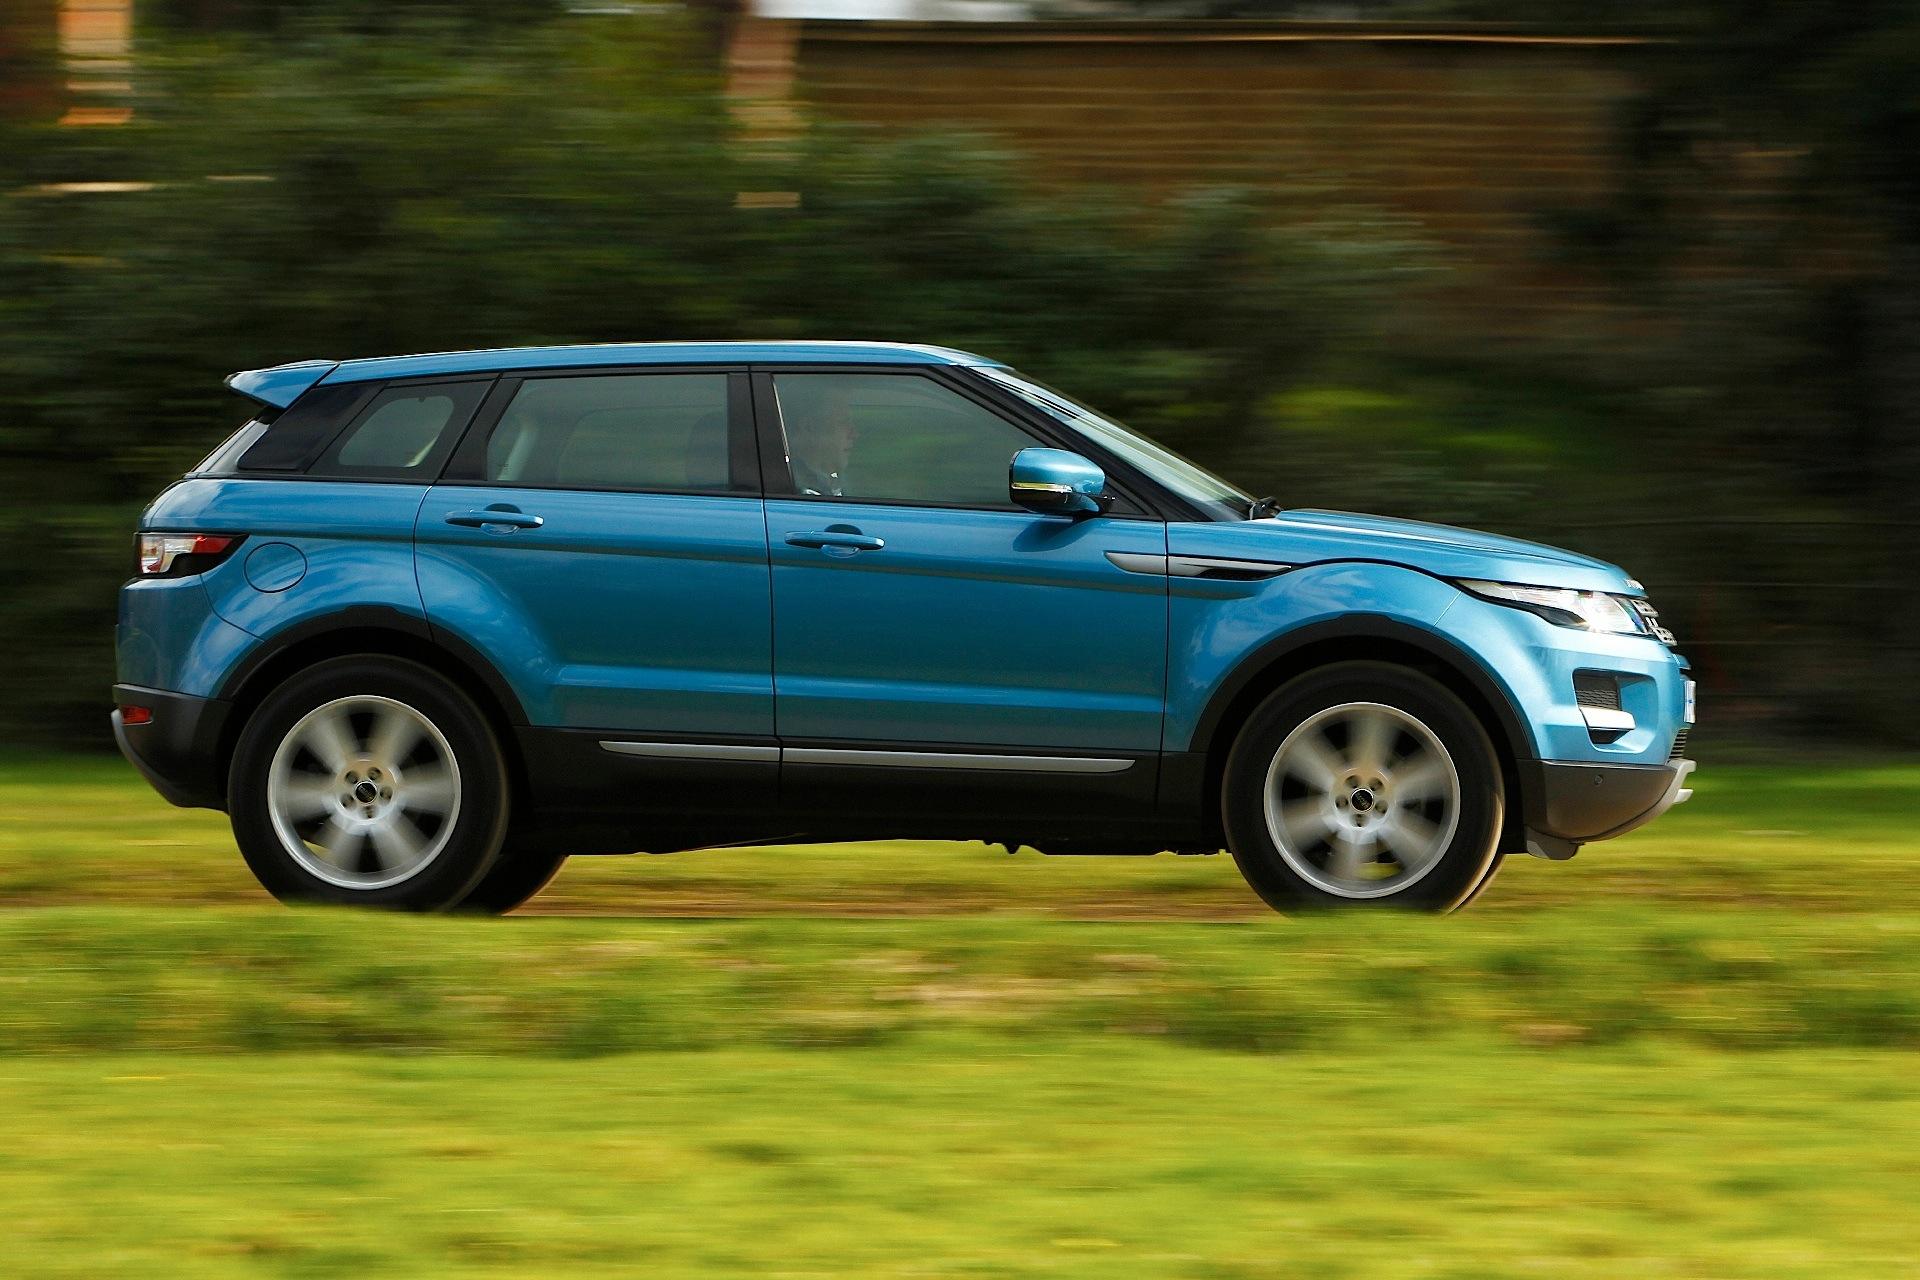 2015 Land Rover Range Rover Evoque Pure >> LAND ROVER Range Rover Evoque 5 Door - 2011, 2012, 2013, 2014, 2015 - autoevolution